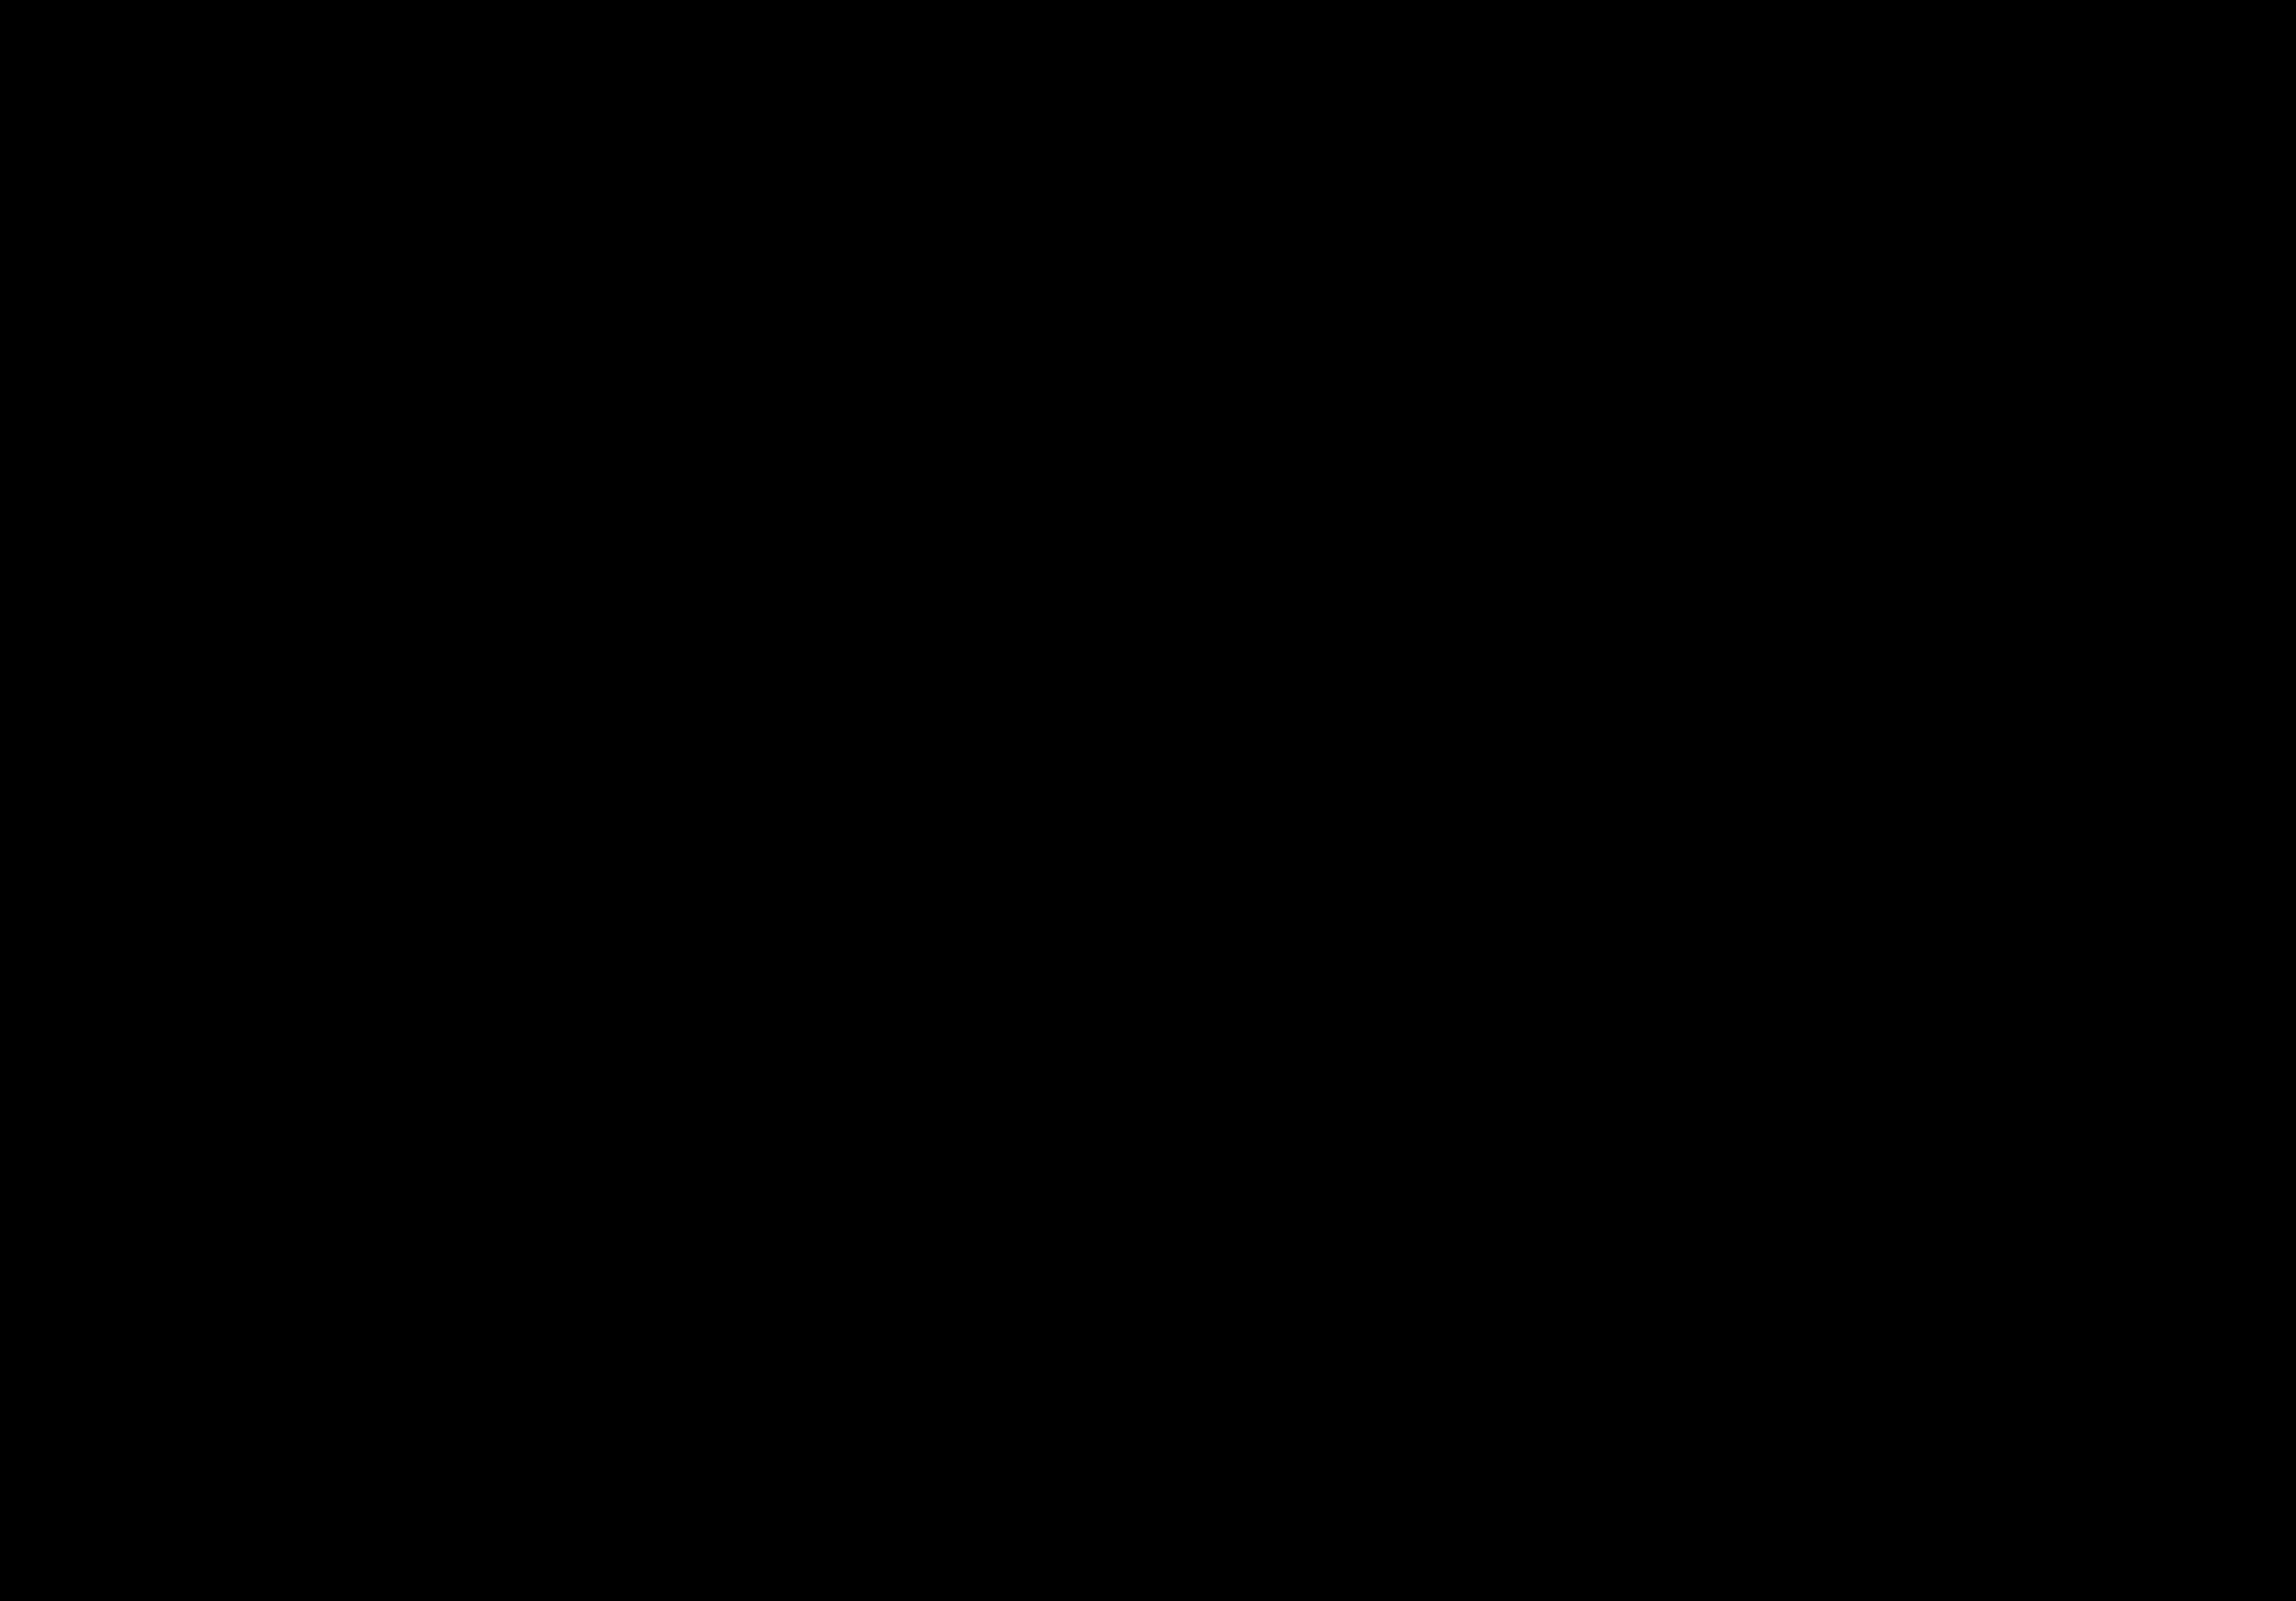 Cartoon image of a peace dove